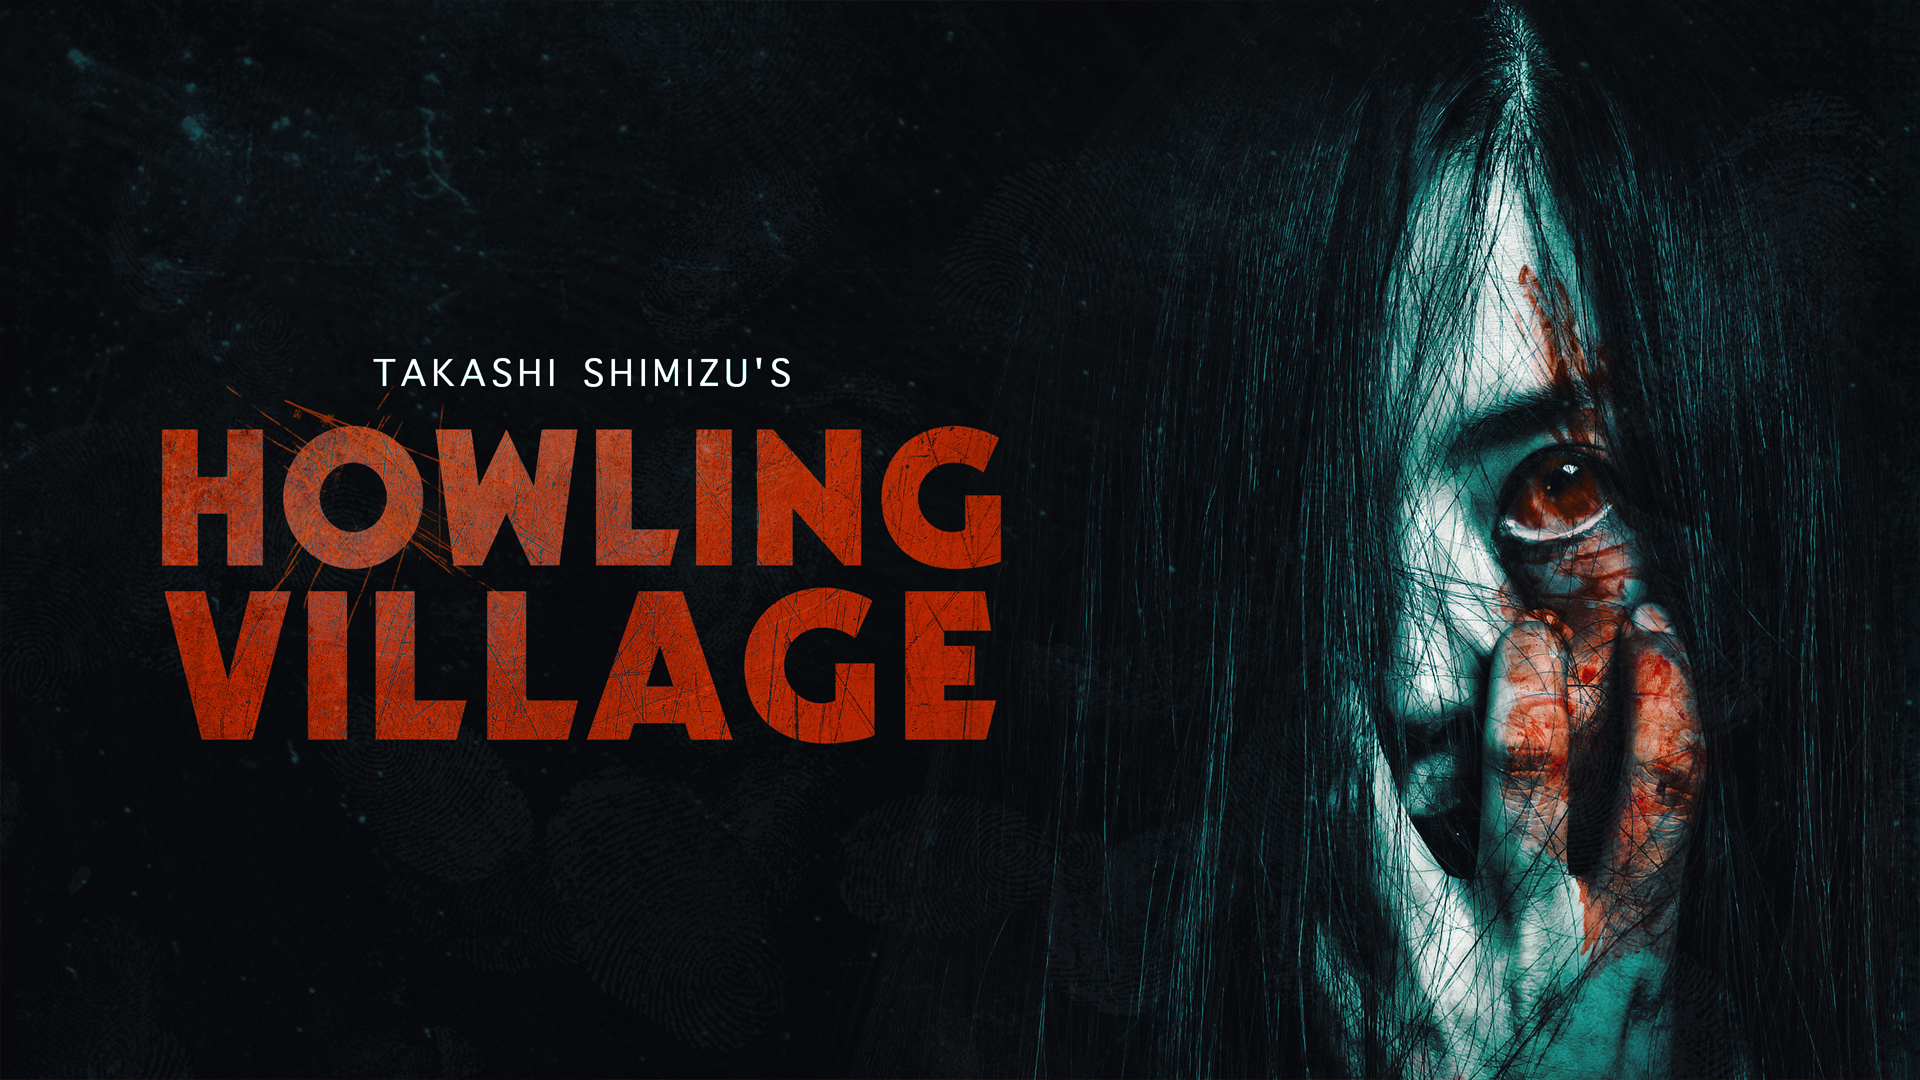 Howling Village